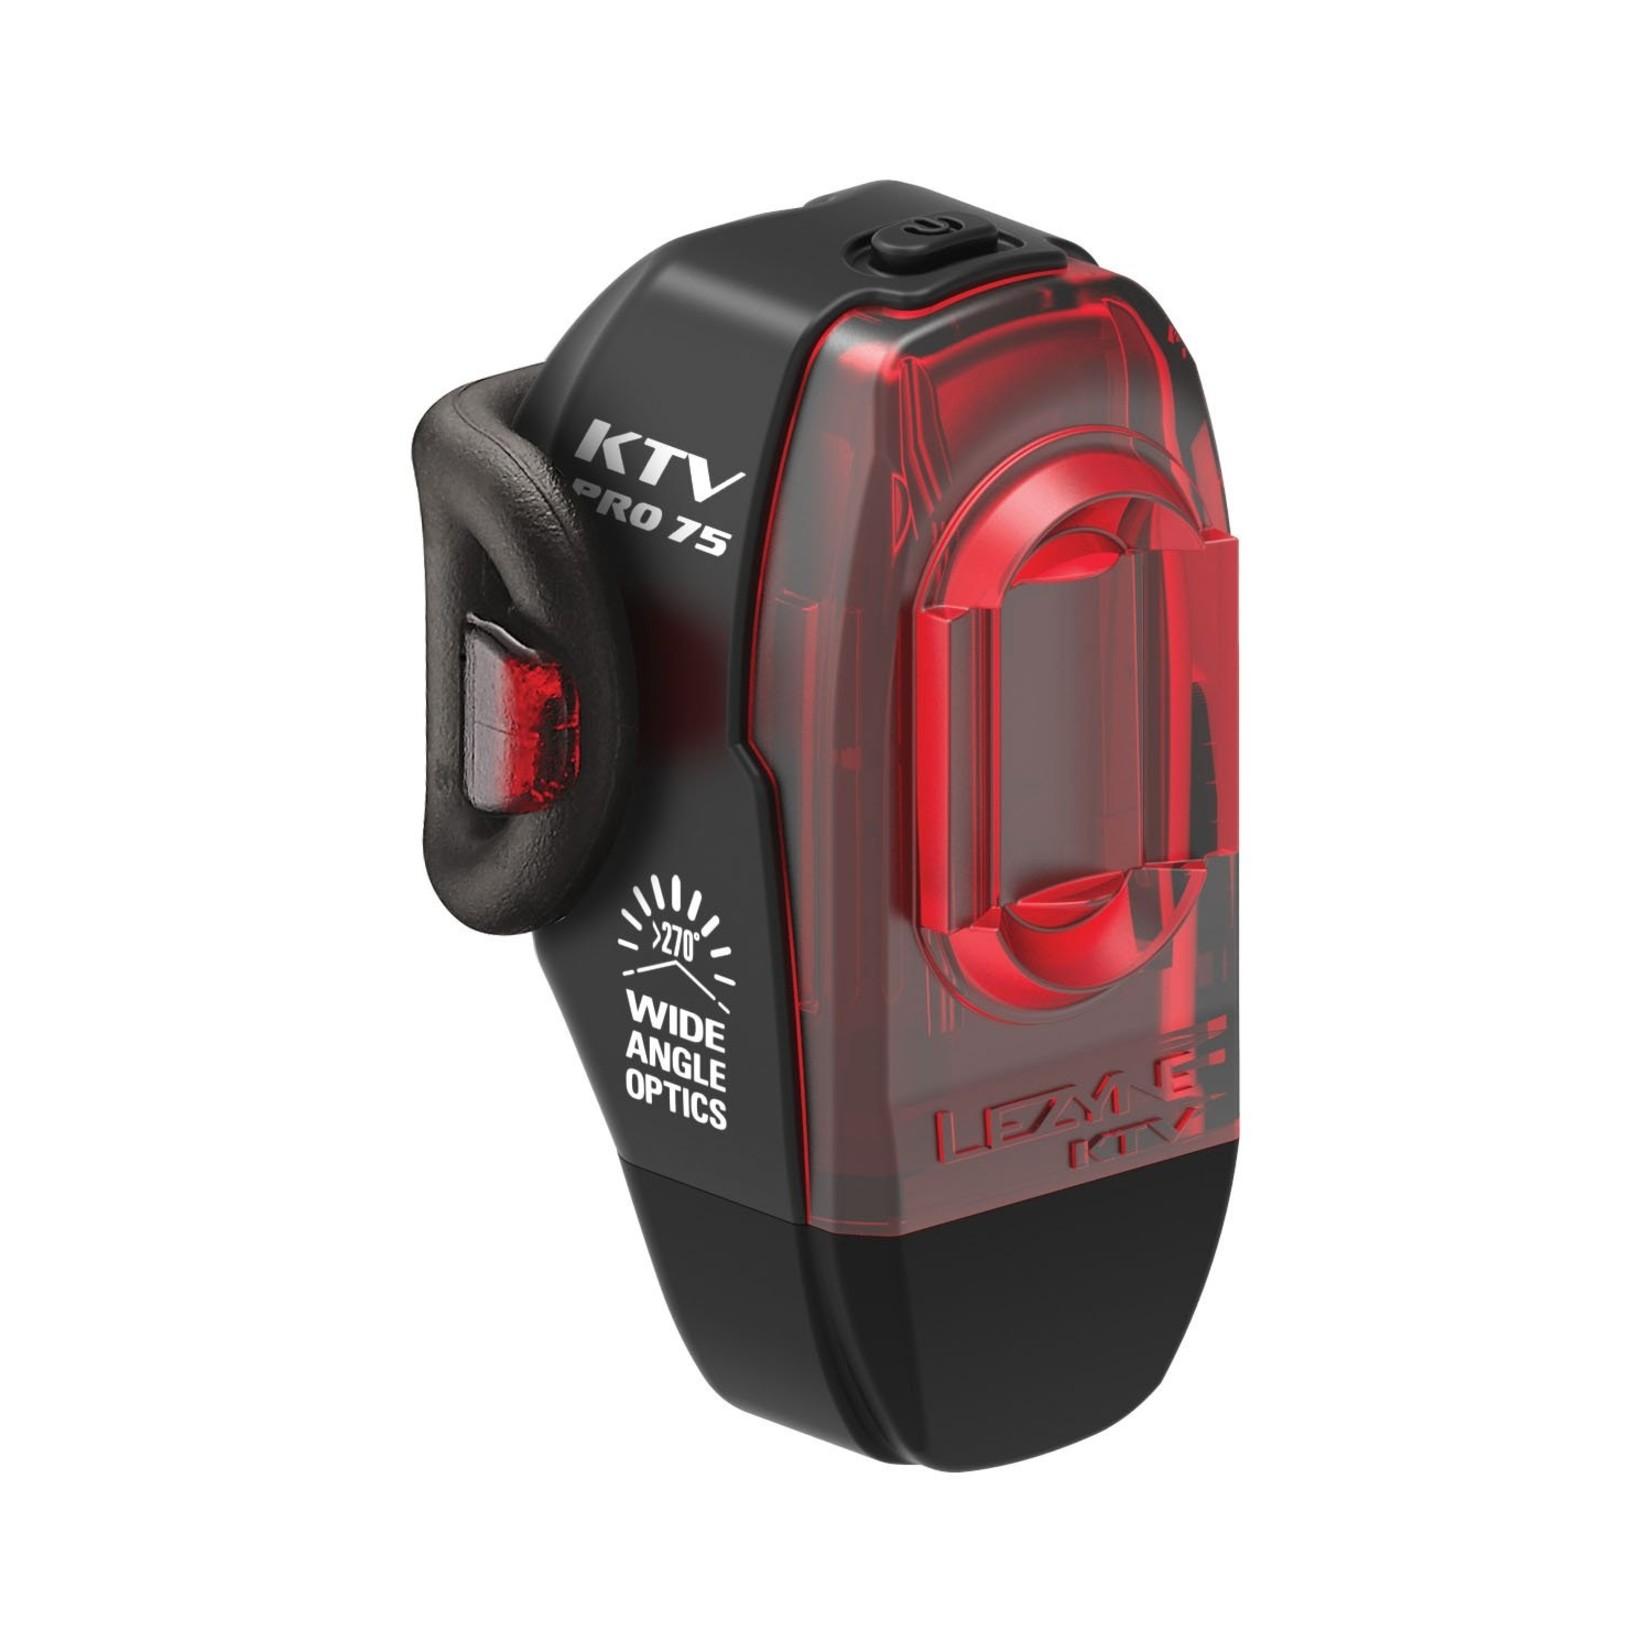 Lezyne LEZYNE LED PRO REAR - BLACK 75 LUMEN, USB RECHARGEABLE, CO-MOLD BODY, Y13